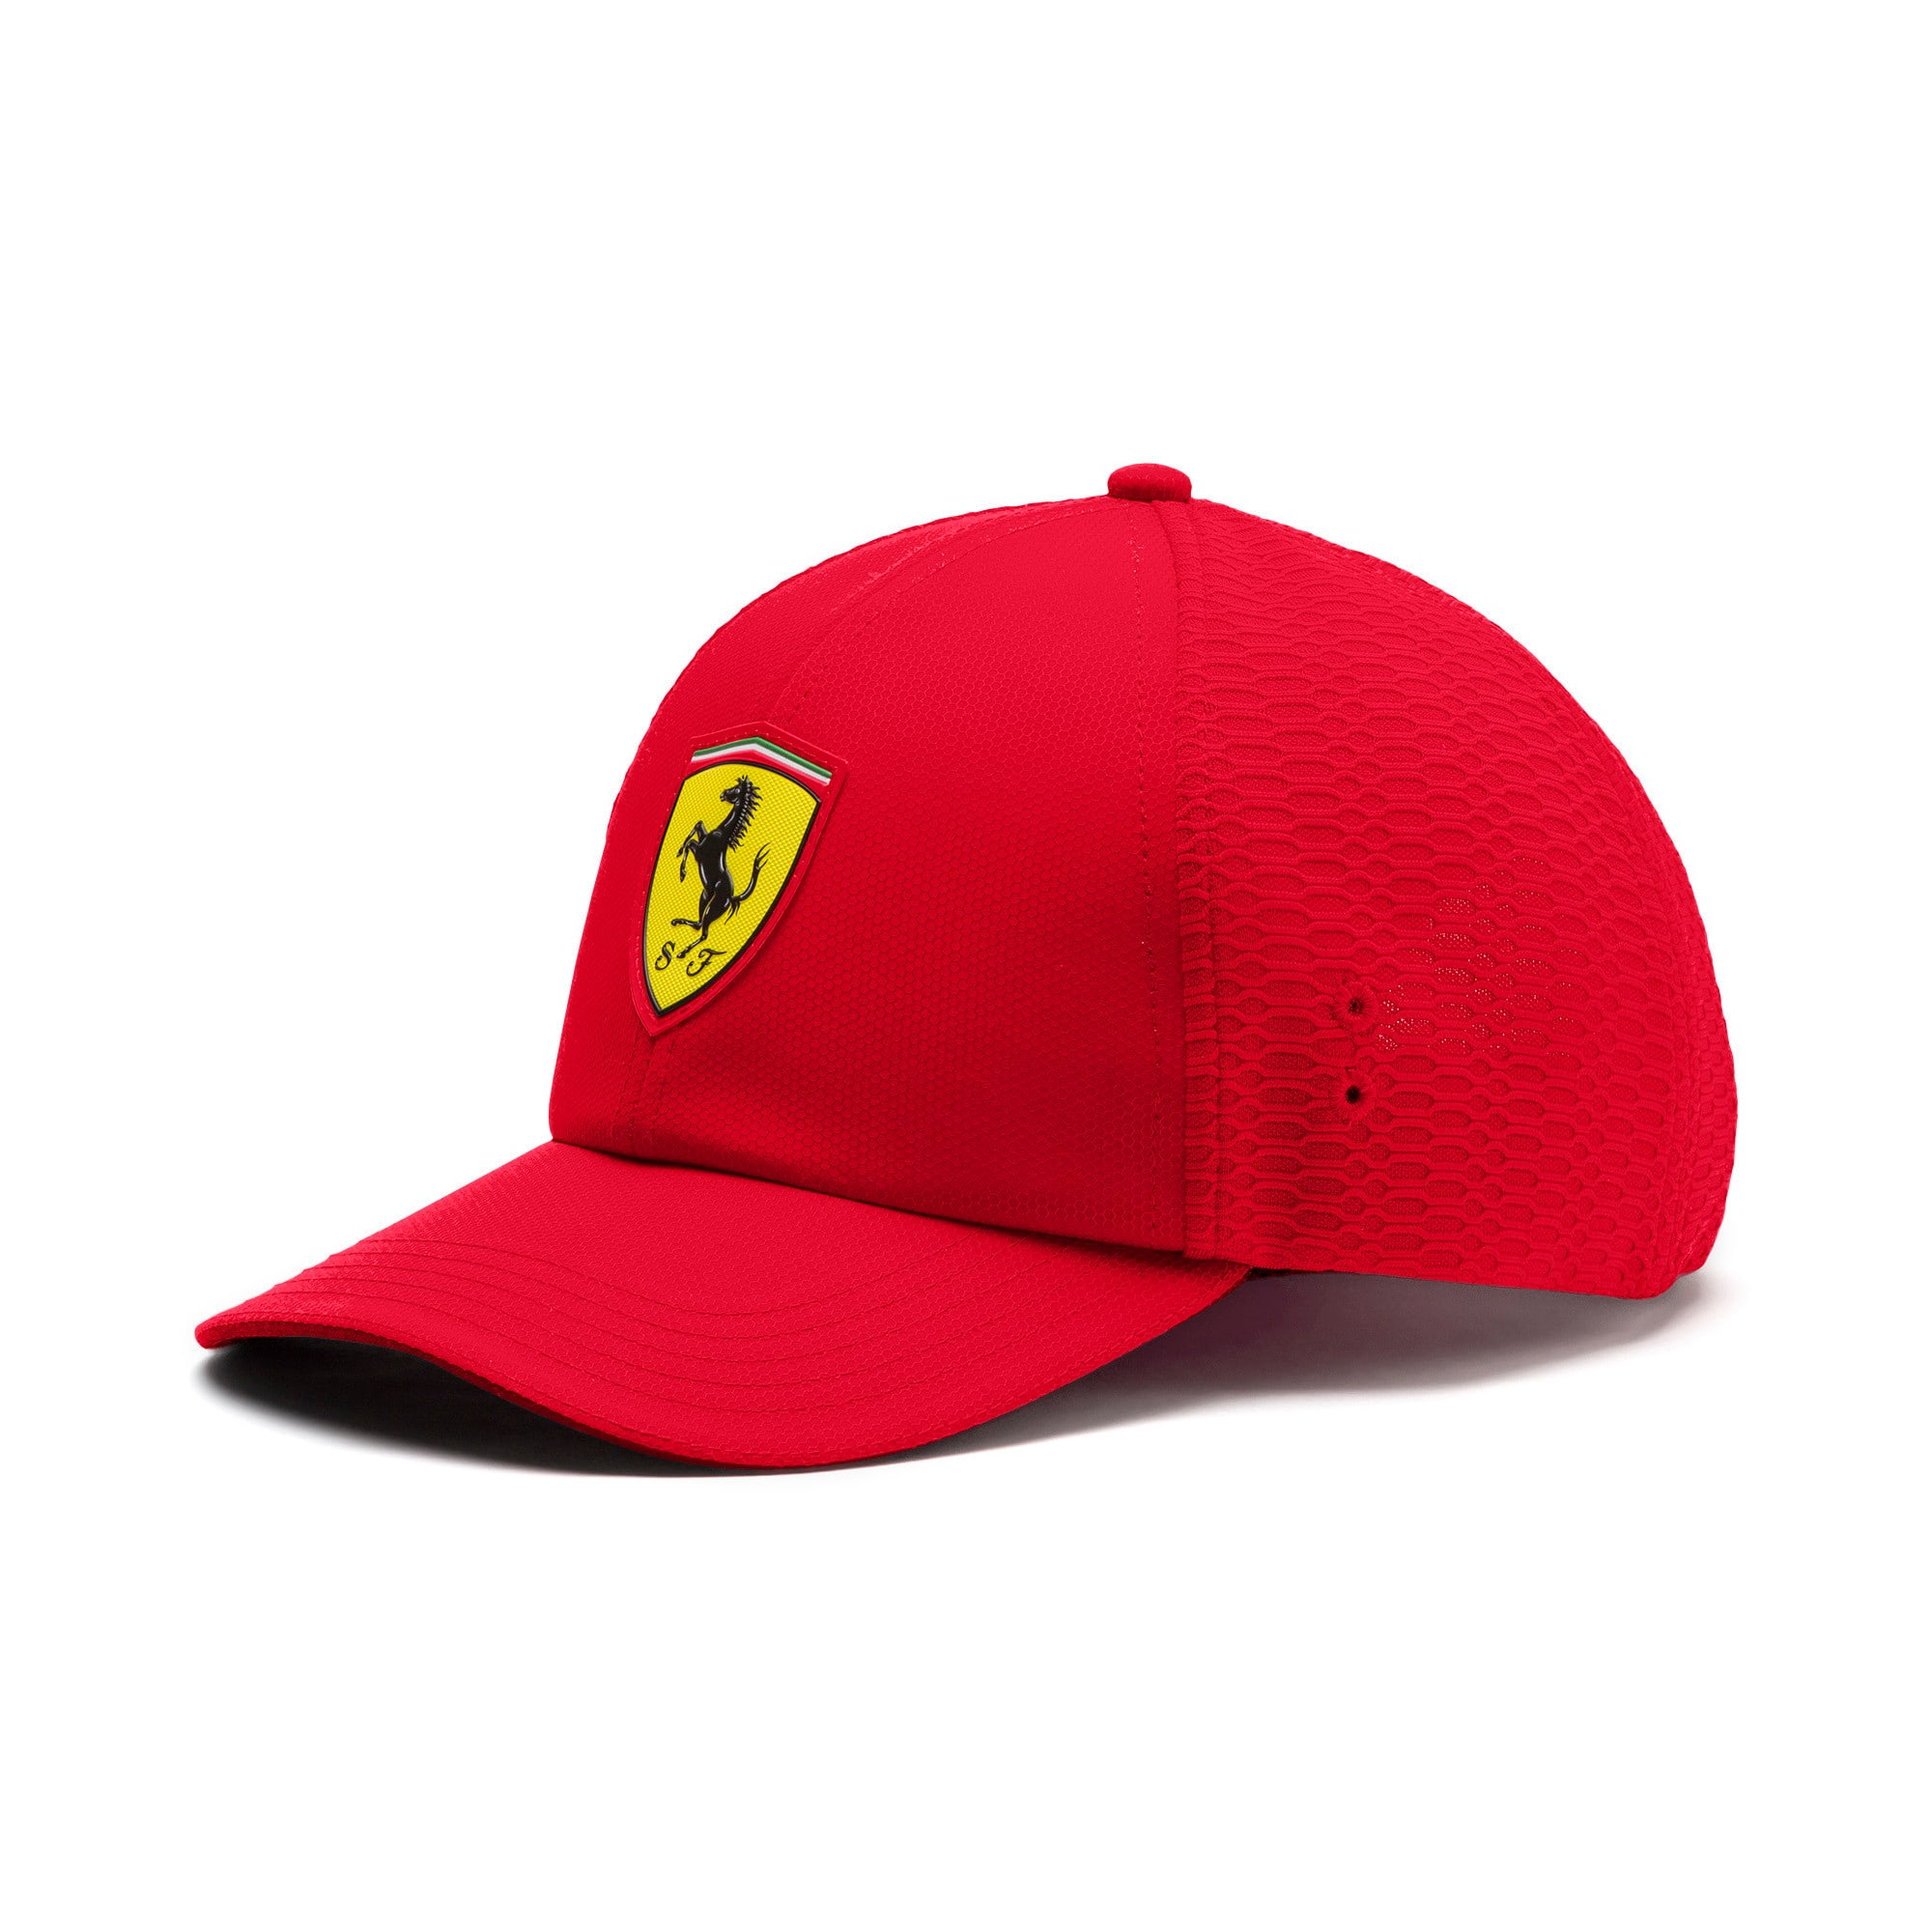 Thumbnail 1 of Ferrari Fanwear Trucker Cap, Rosso Corsa, medium-IND